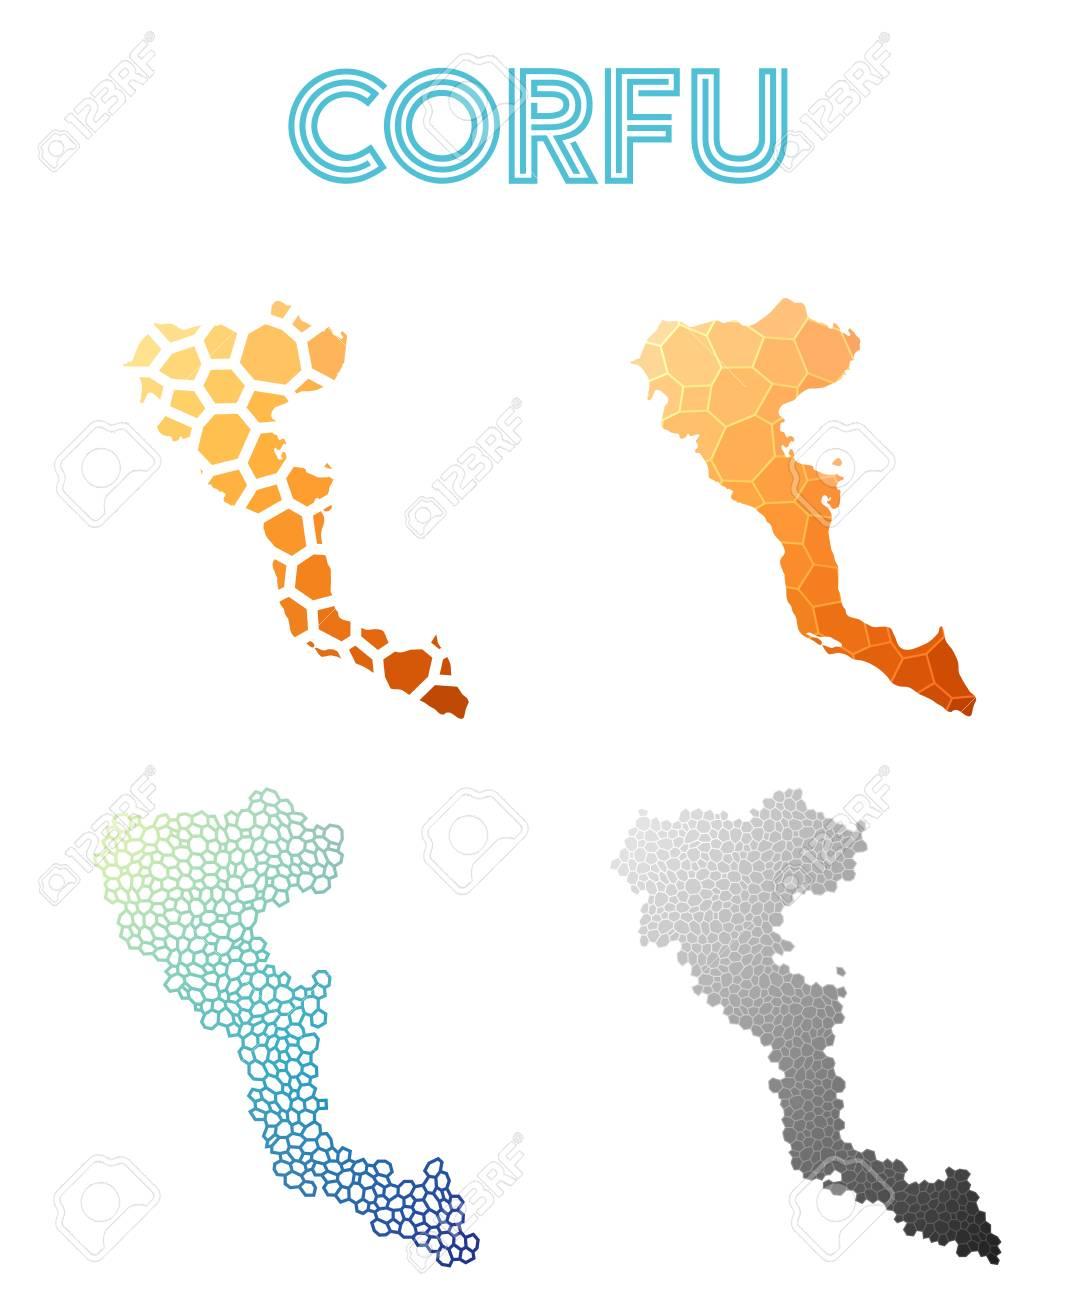 Corfu Polygonal Island Map Mosaic Style Maps Collection Bright